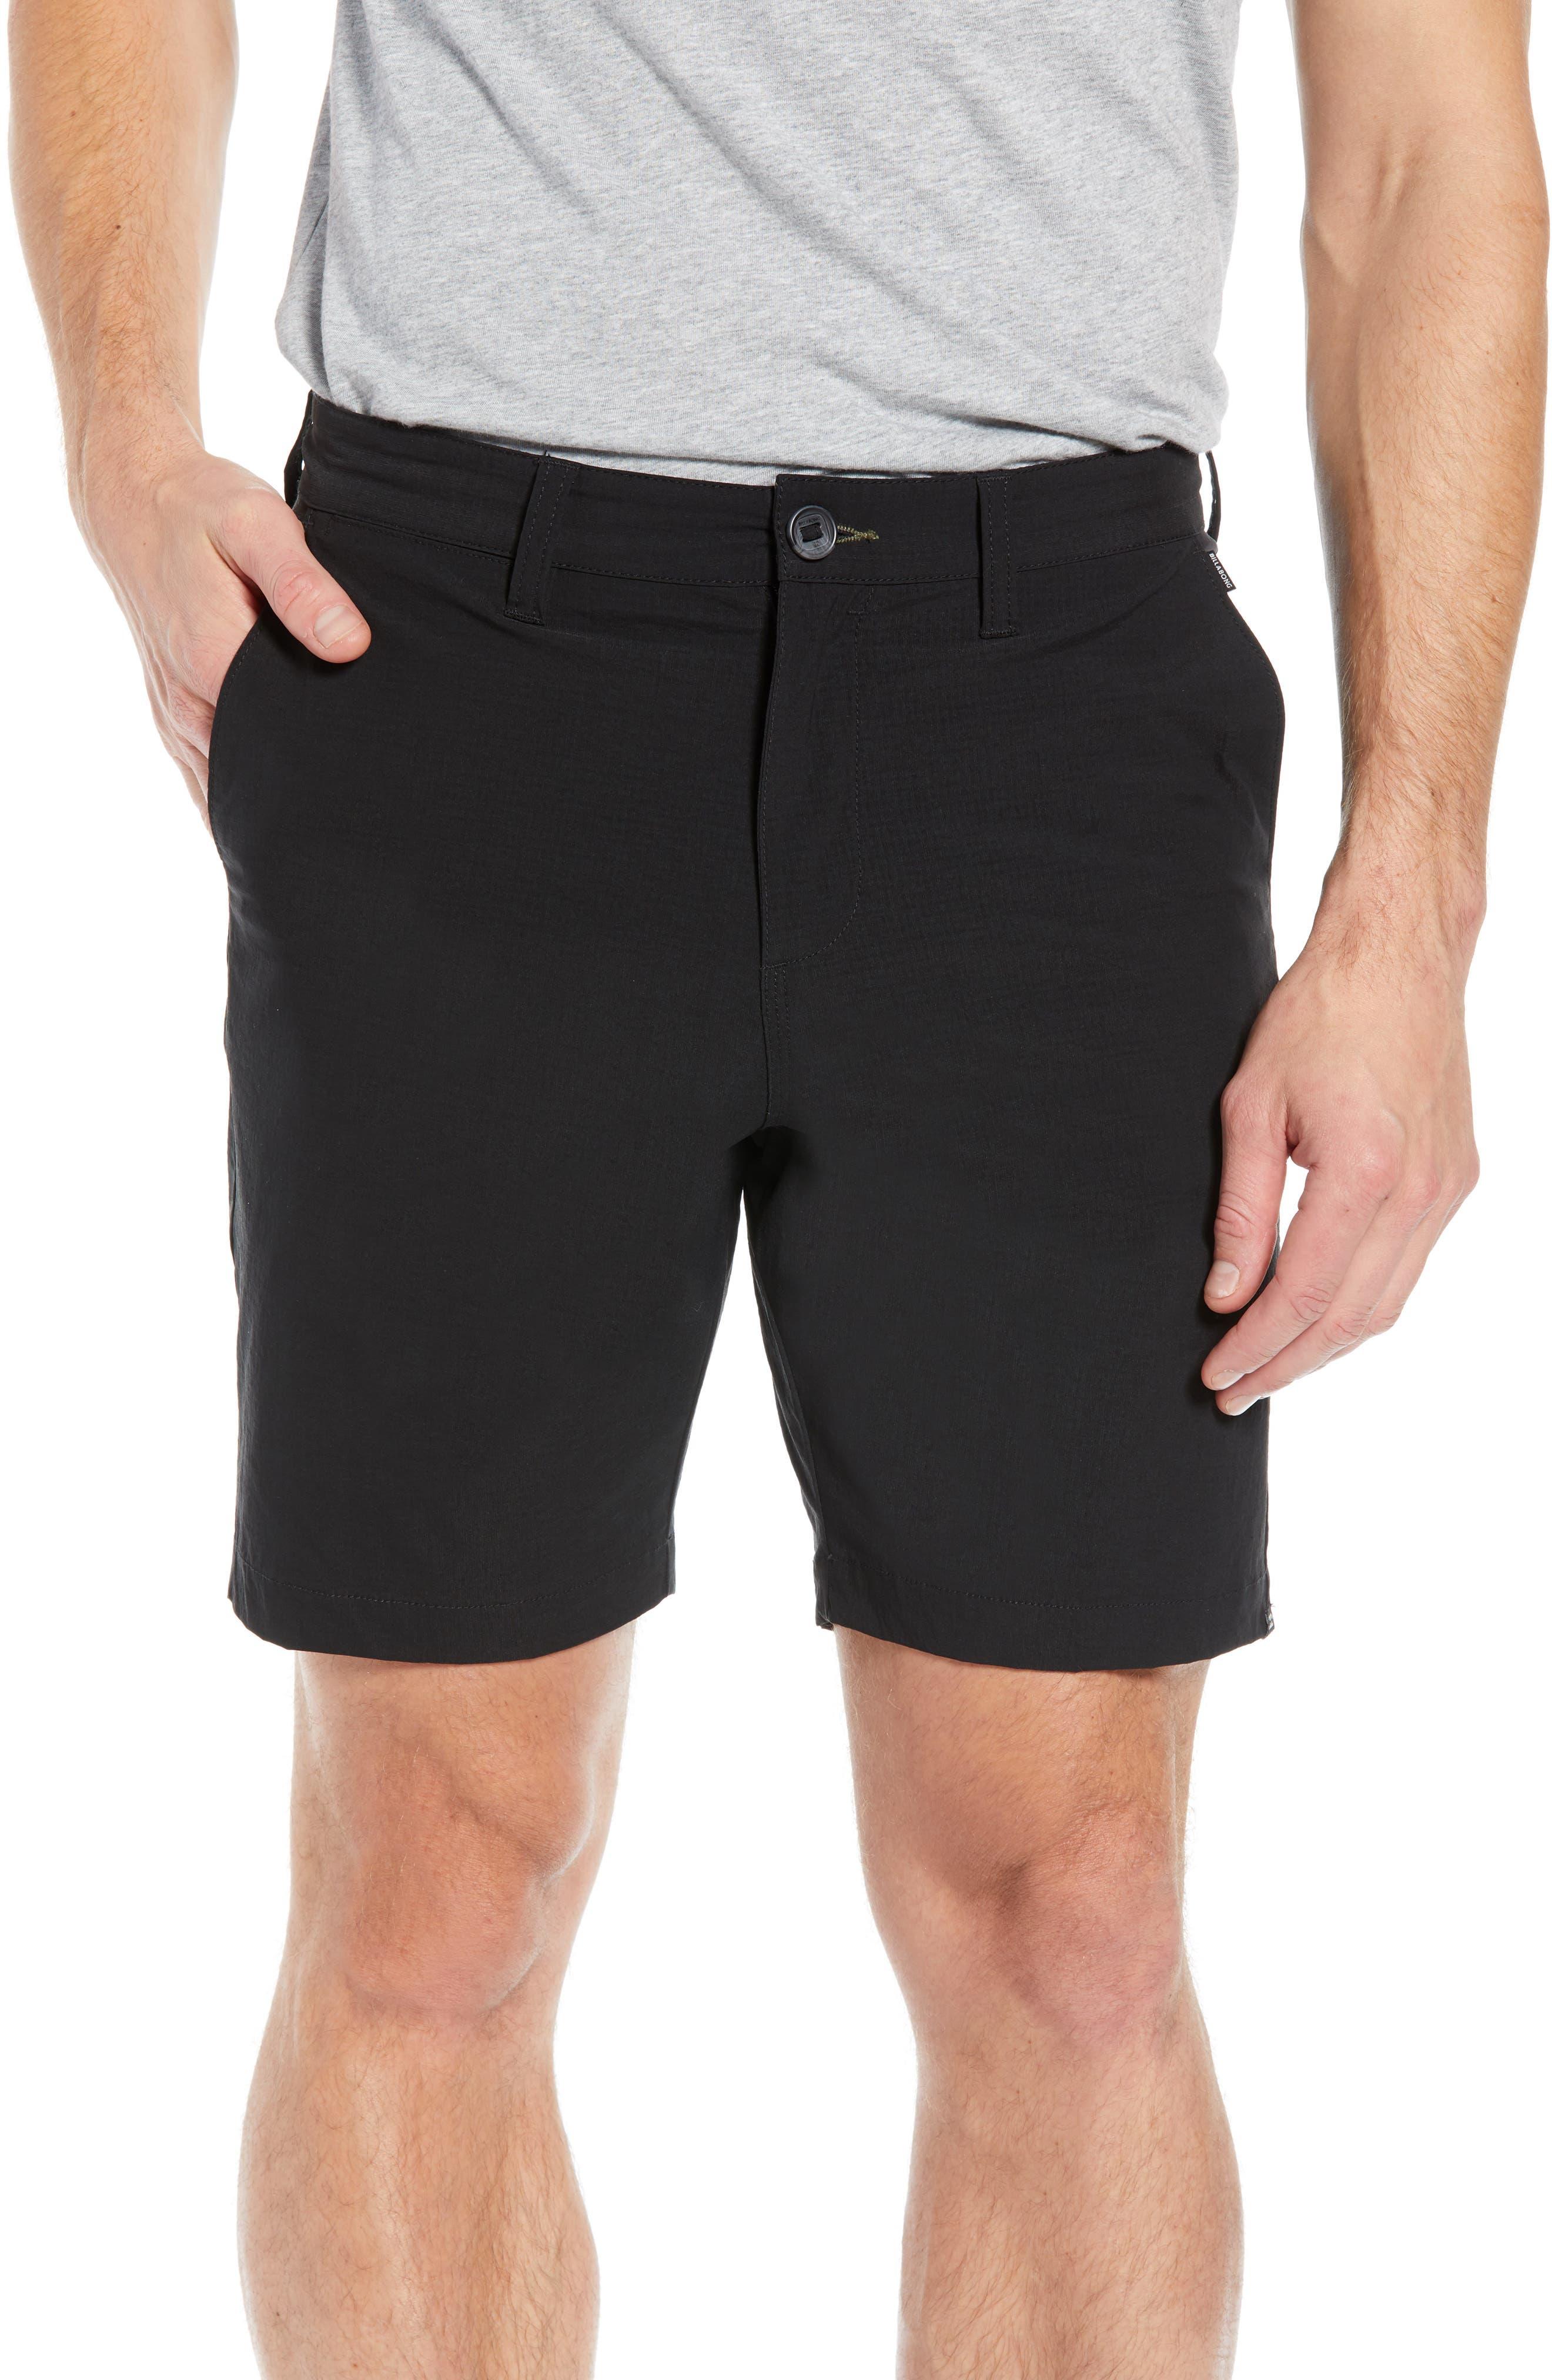 Surfreak Hybrid Shorts,                         Main,                         color, BLACK